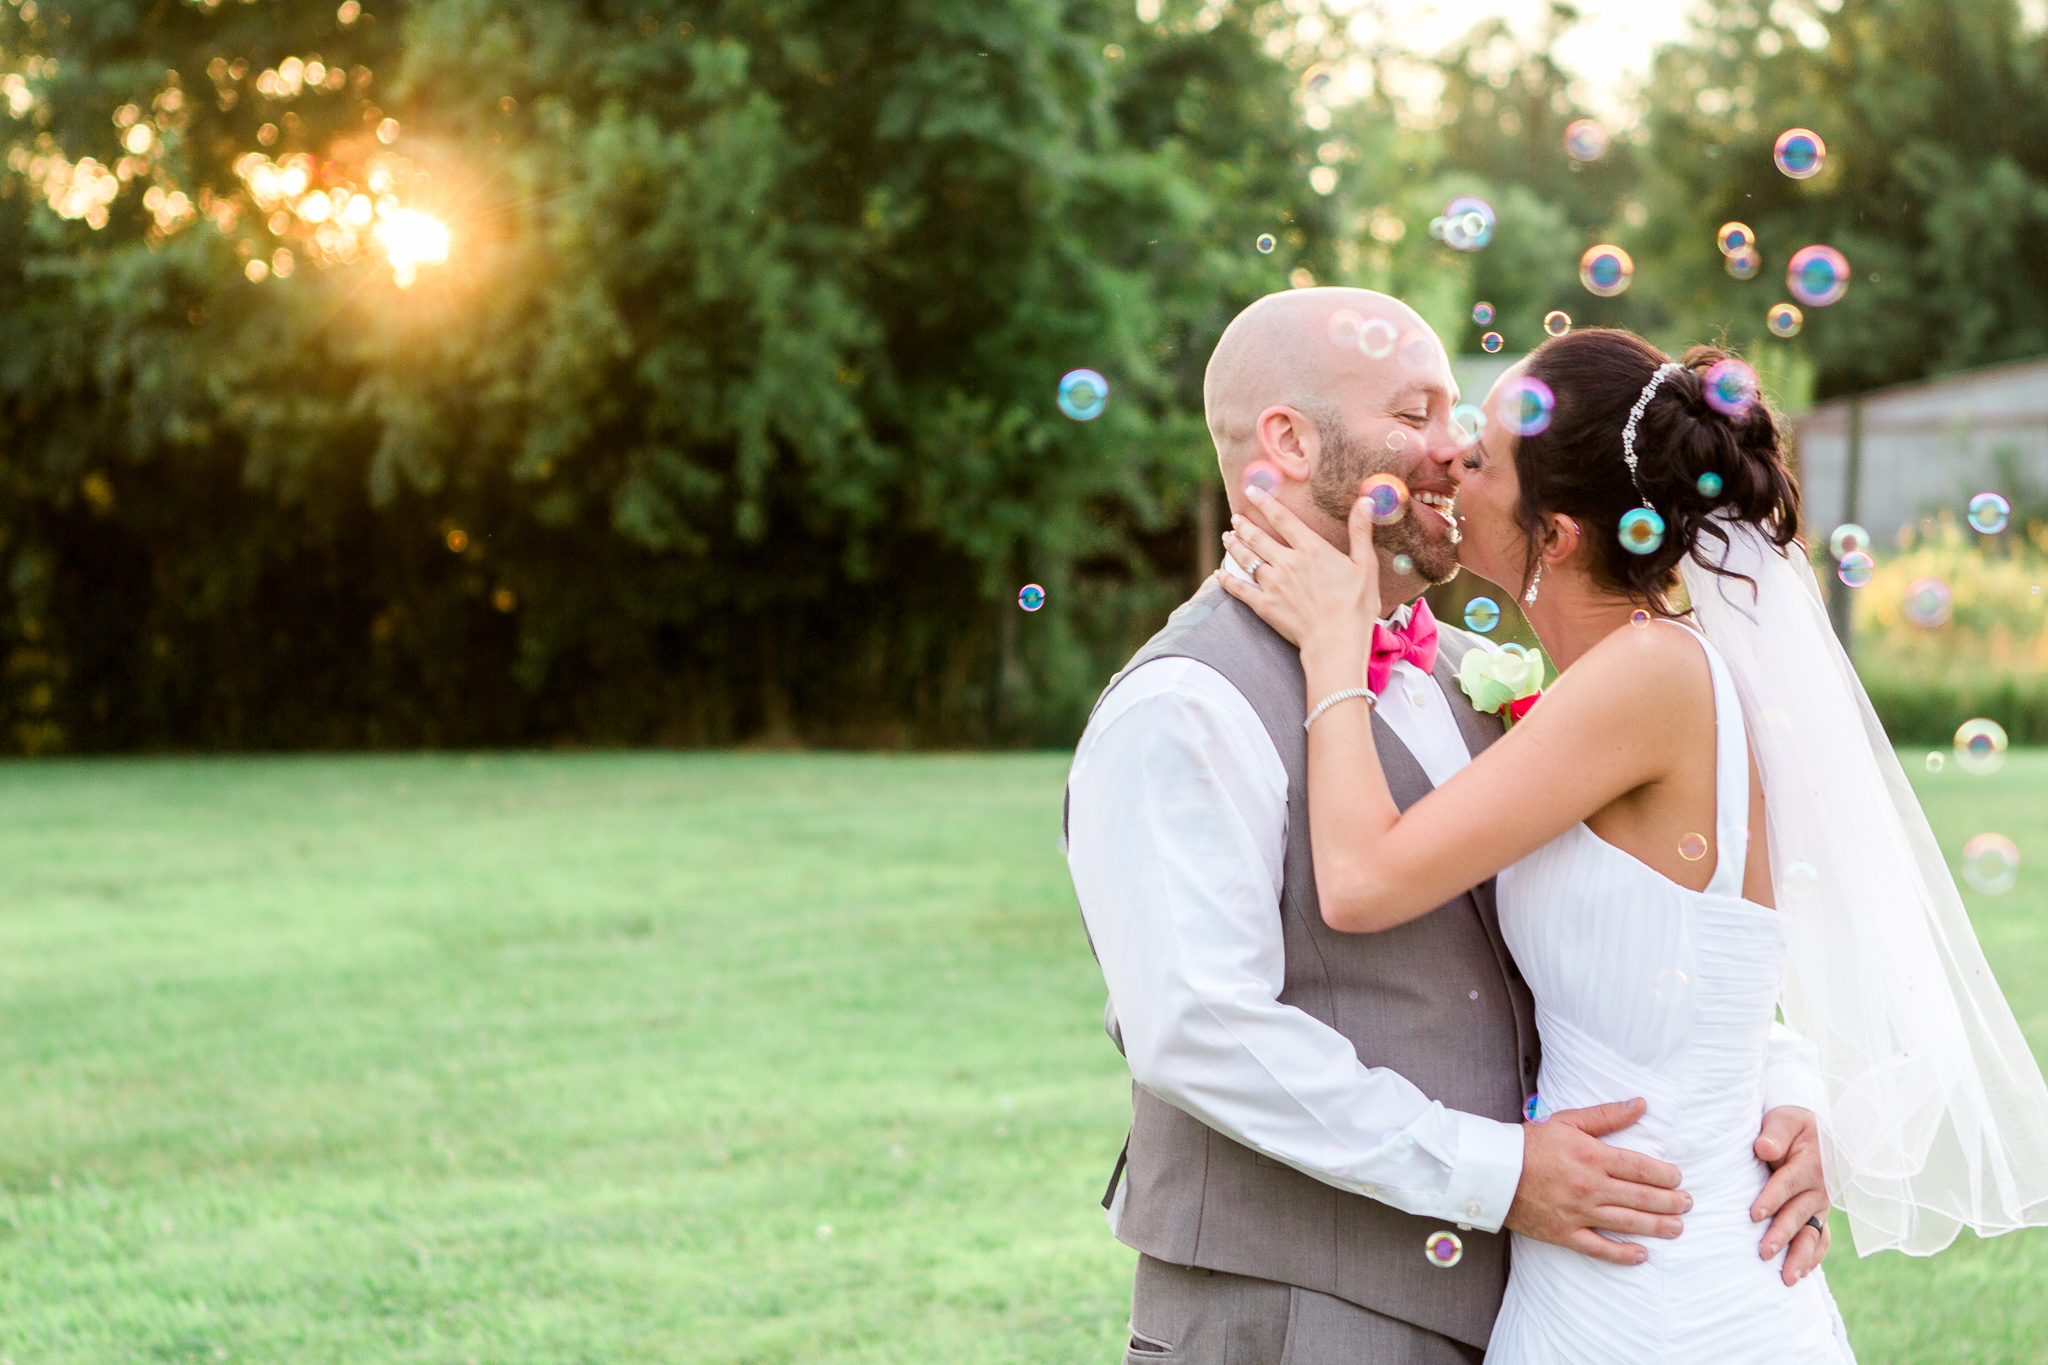 Richmond Kentucky Wedding Photographer - Ariana Jordan Photography -14-2.jpg